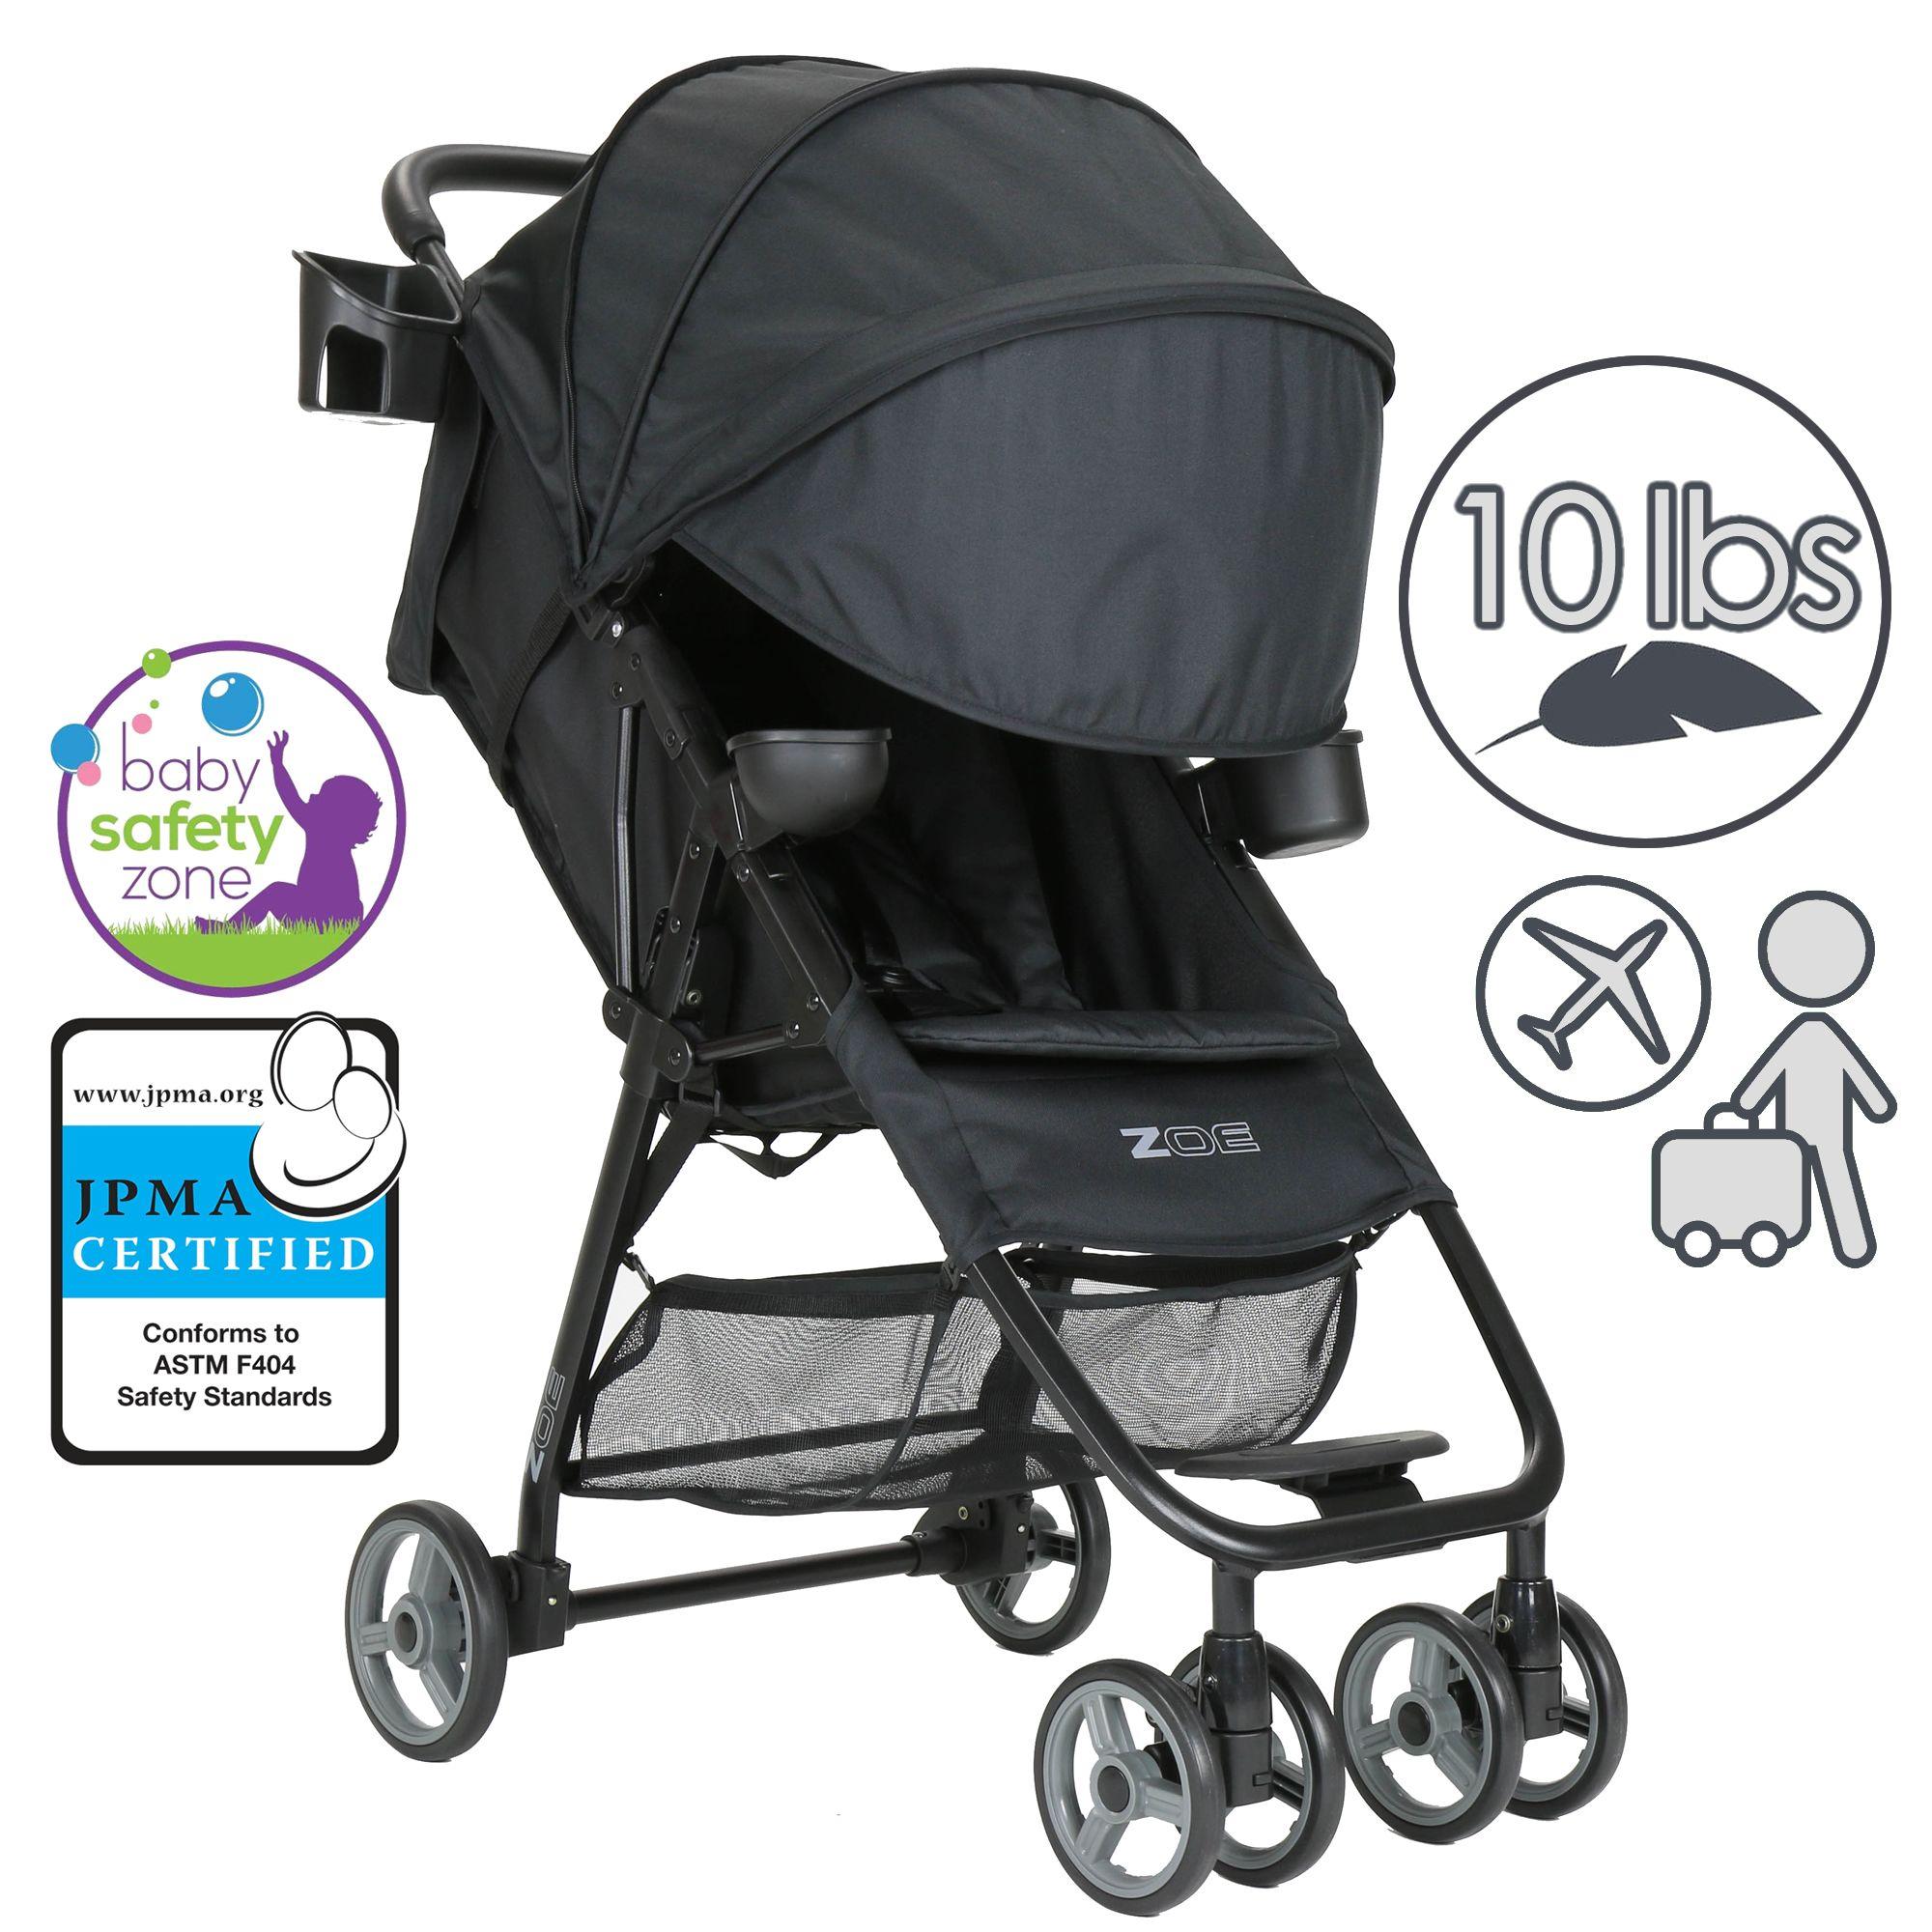 Zoe Trip Stroller Compact Travel Stroller with Umbrella